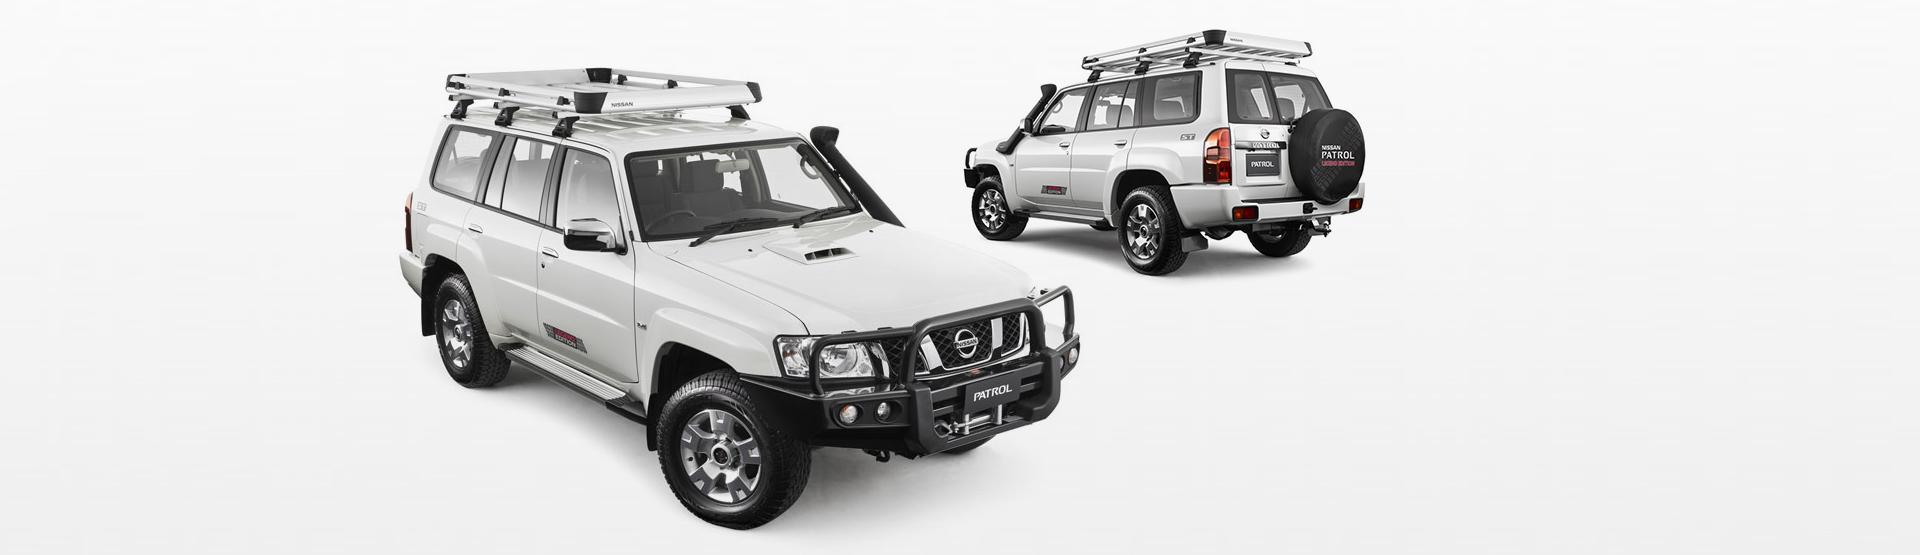 New Nissan Patrol Y61 for sale - Westco Nissan